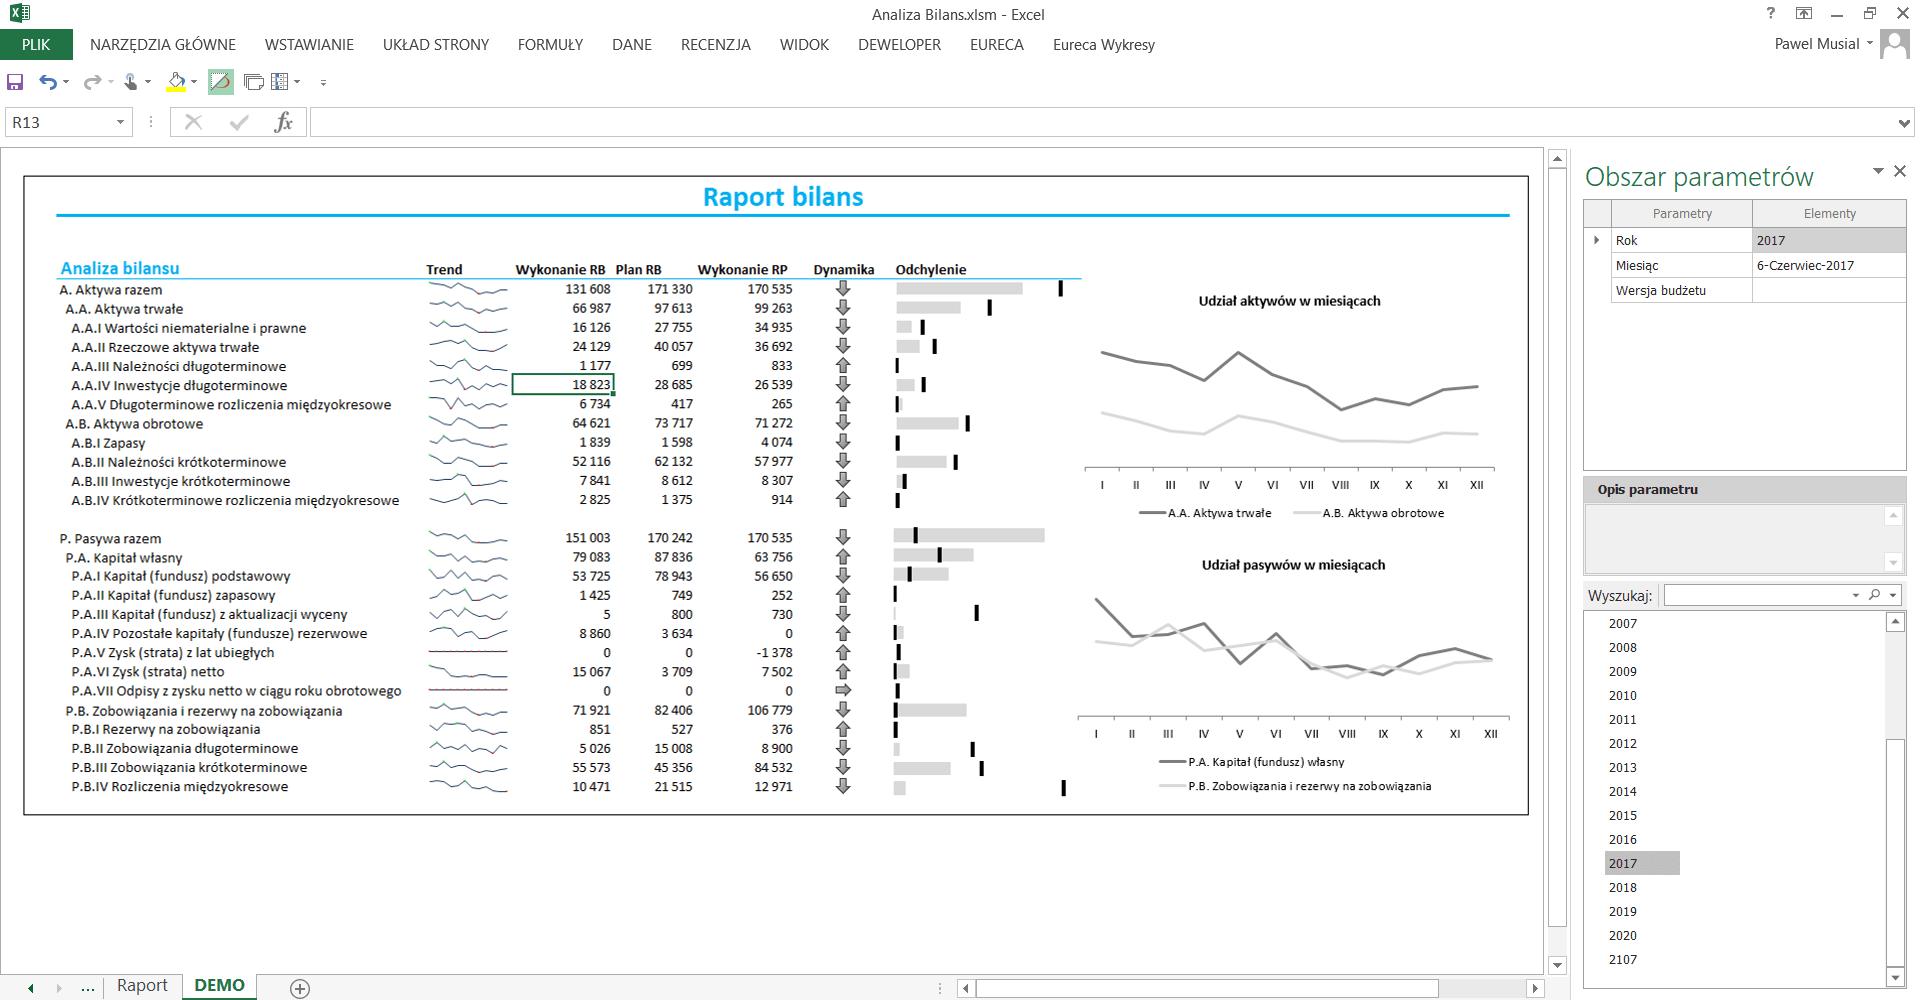 Analiza bilans raport